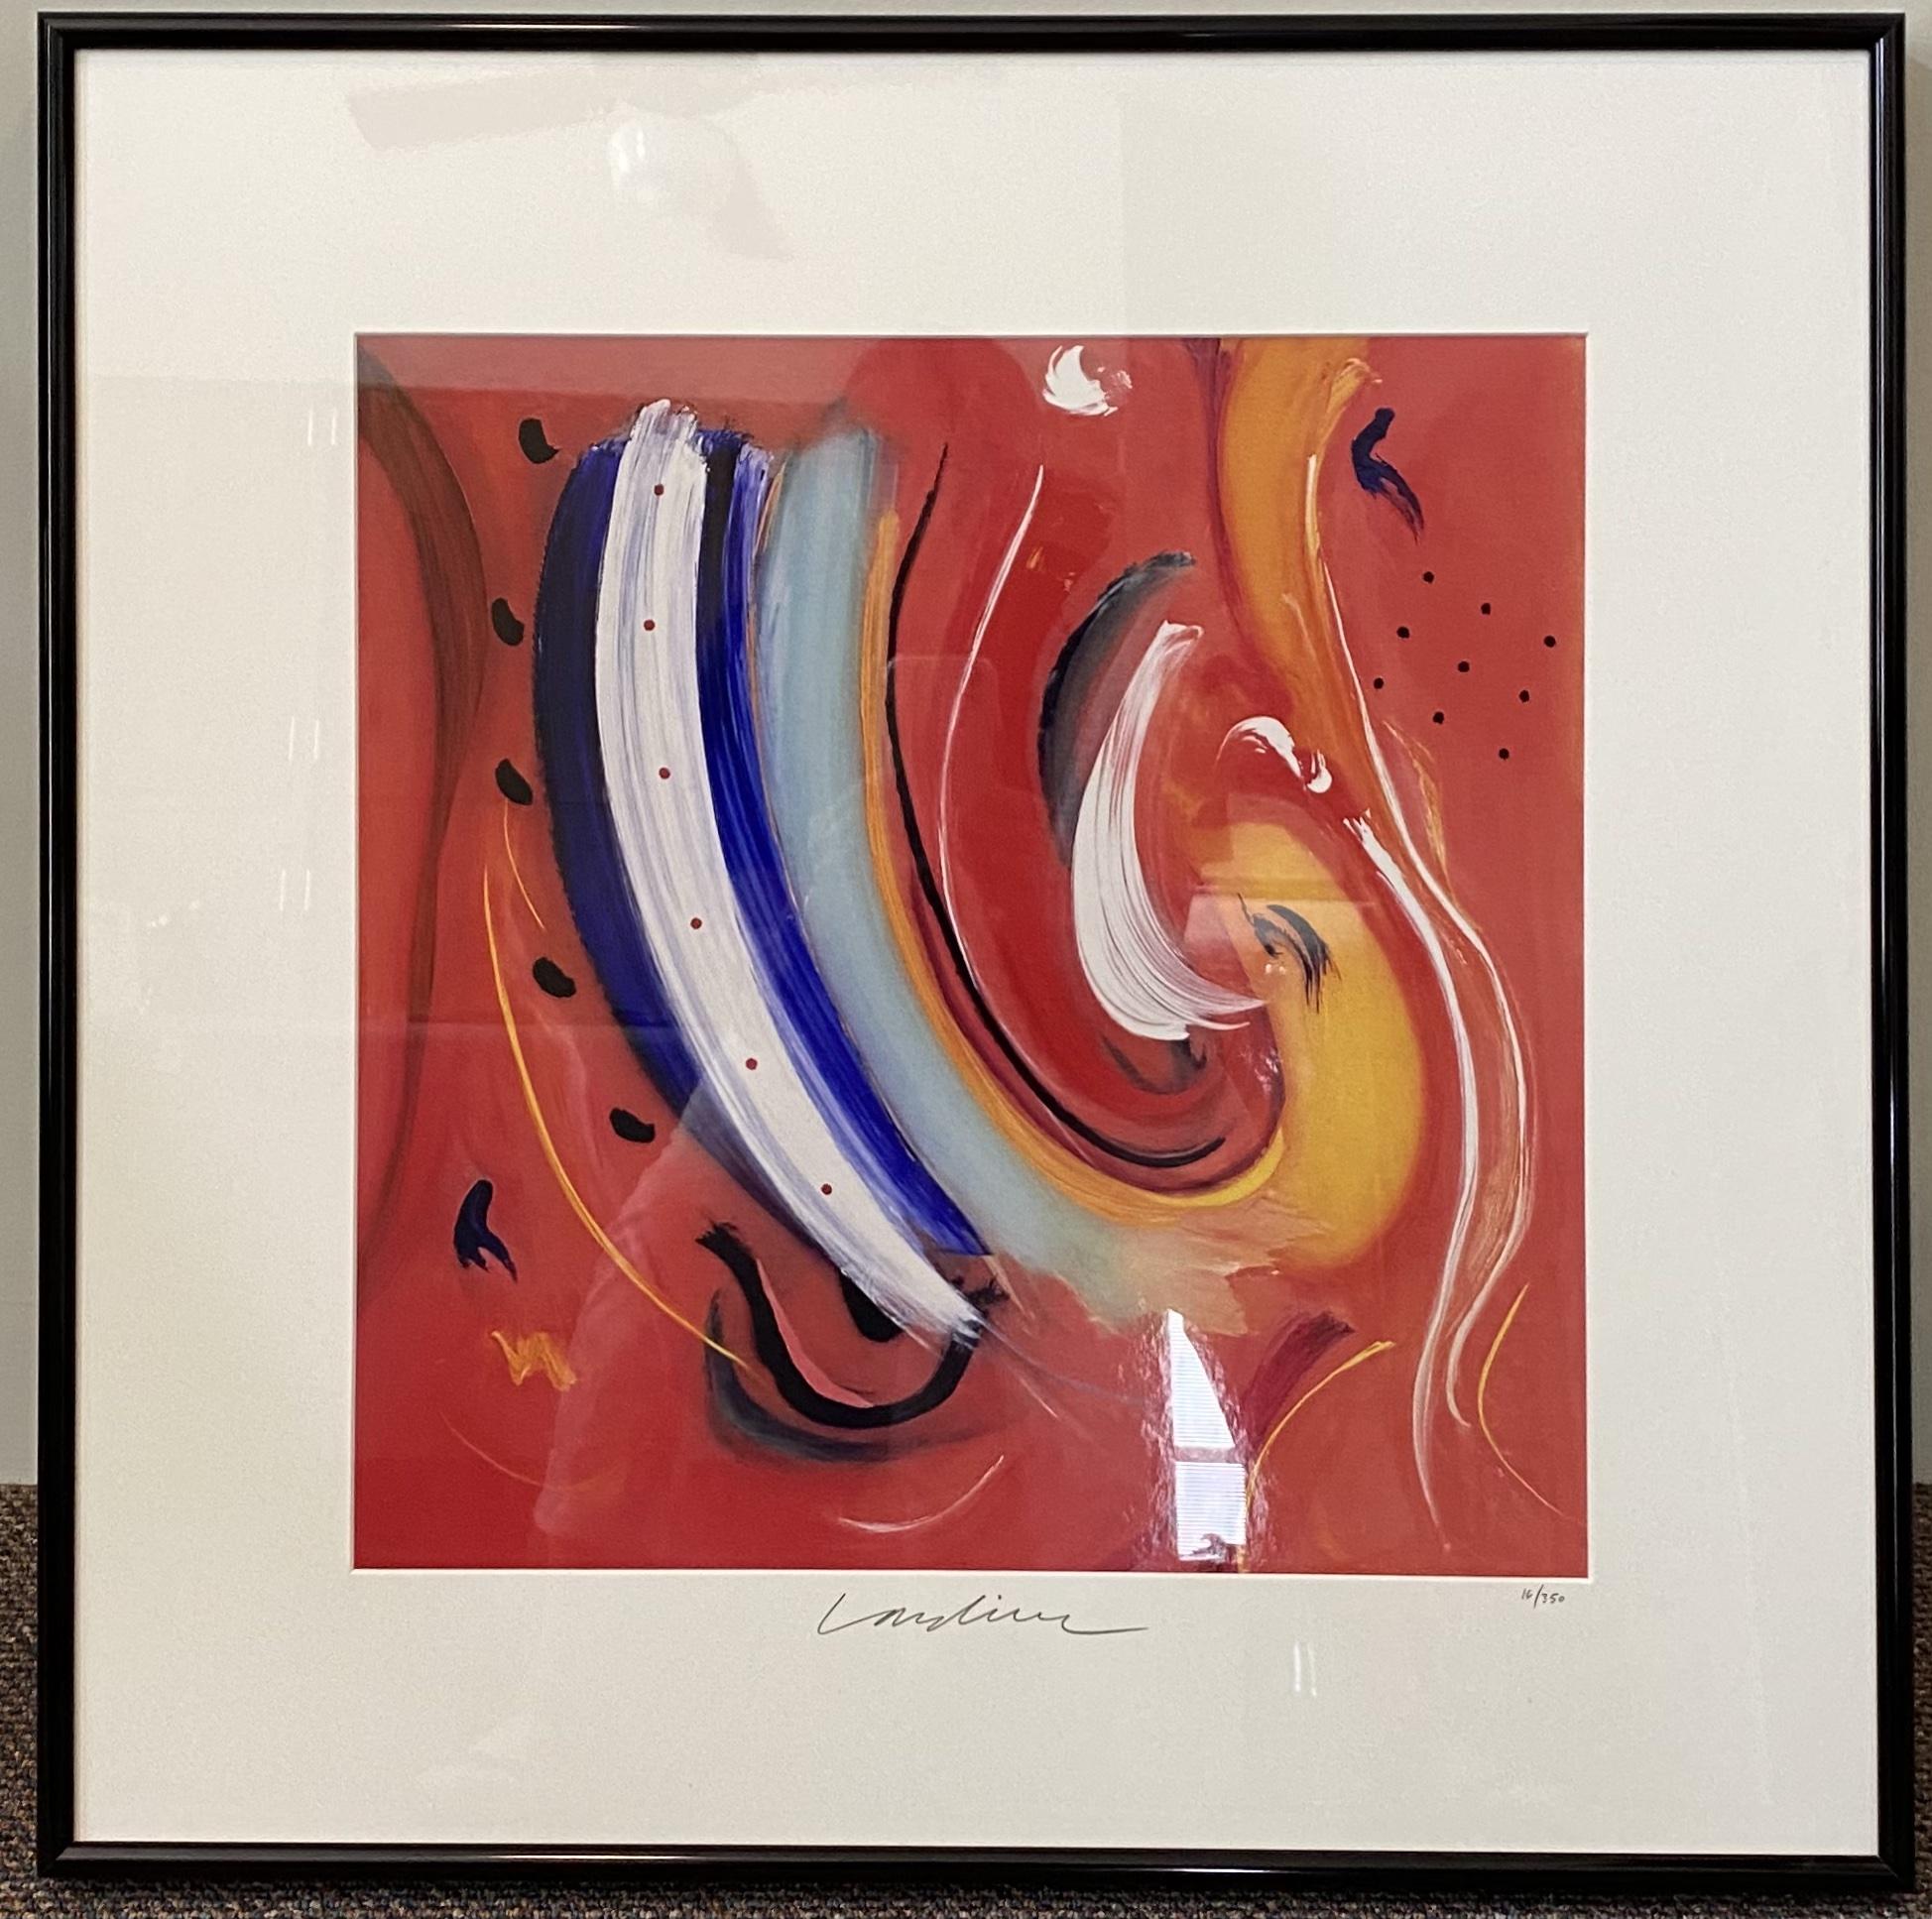 "Geoffrey Lardiere River of My Soul Lithograph 17"" X 17"" $645. SOLD"